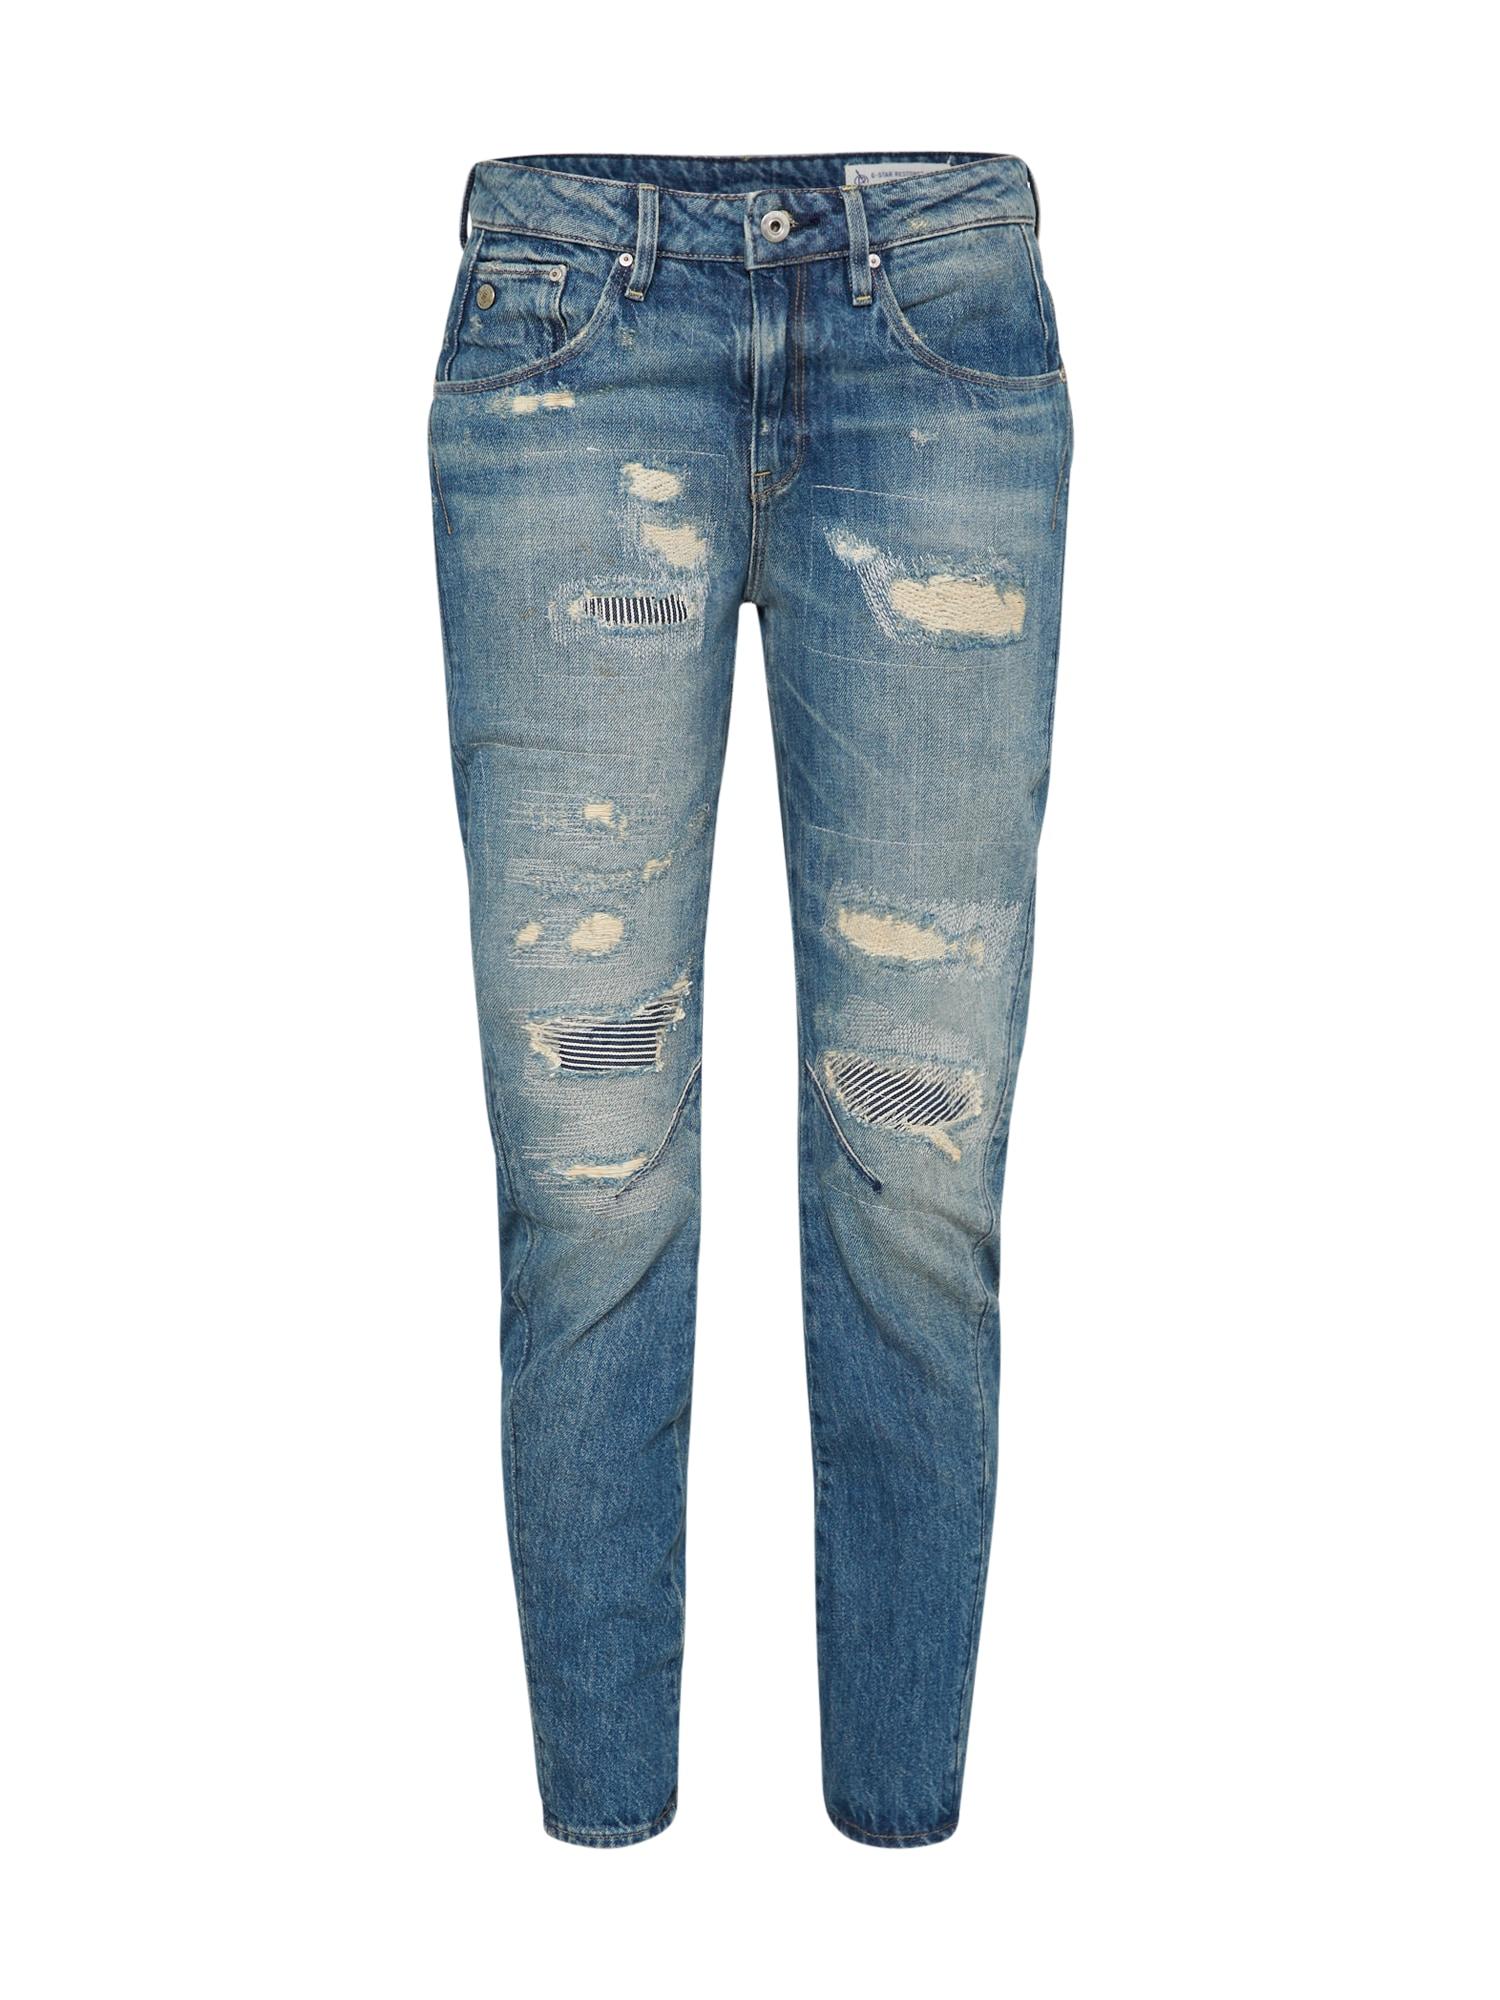 G-STAR RAW Dames Jeans Boyfriend blauw